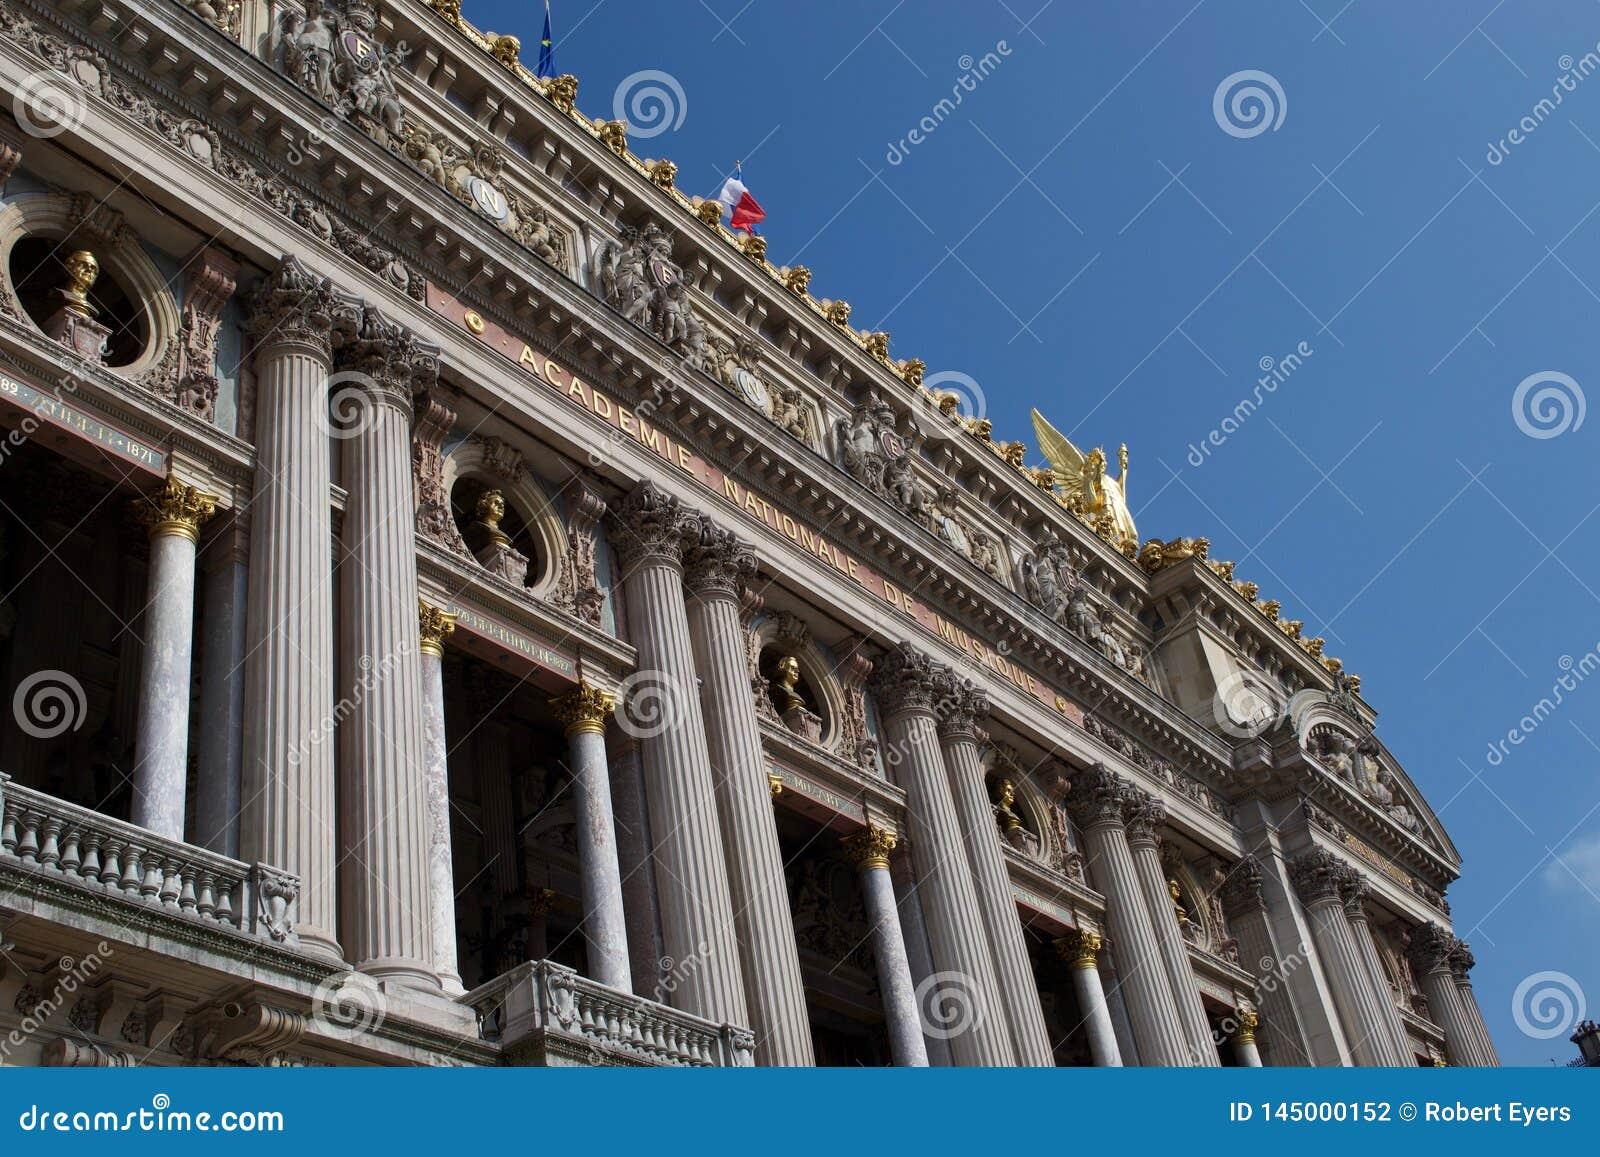 Entrata al Palais Garnier - Academie Nationale De Muisque - opera Francia di Parigi